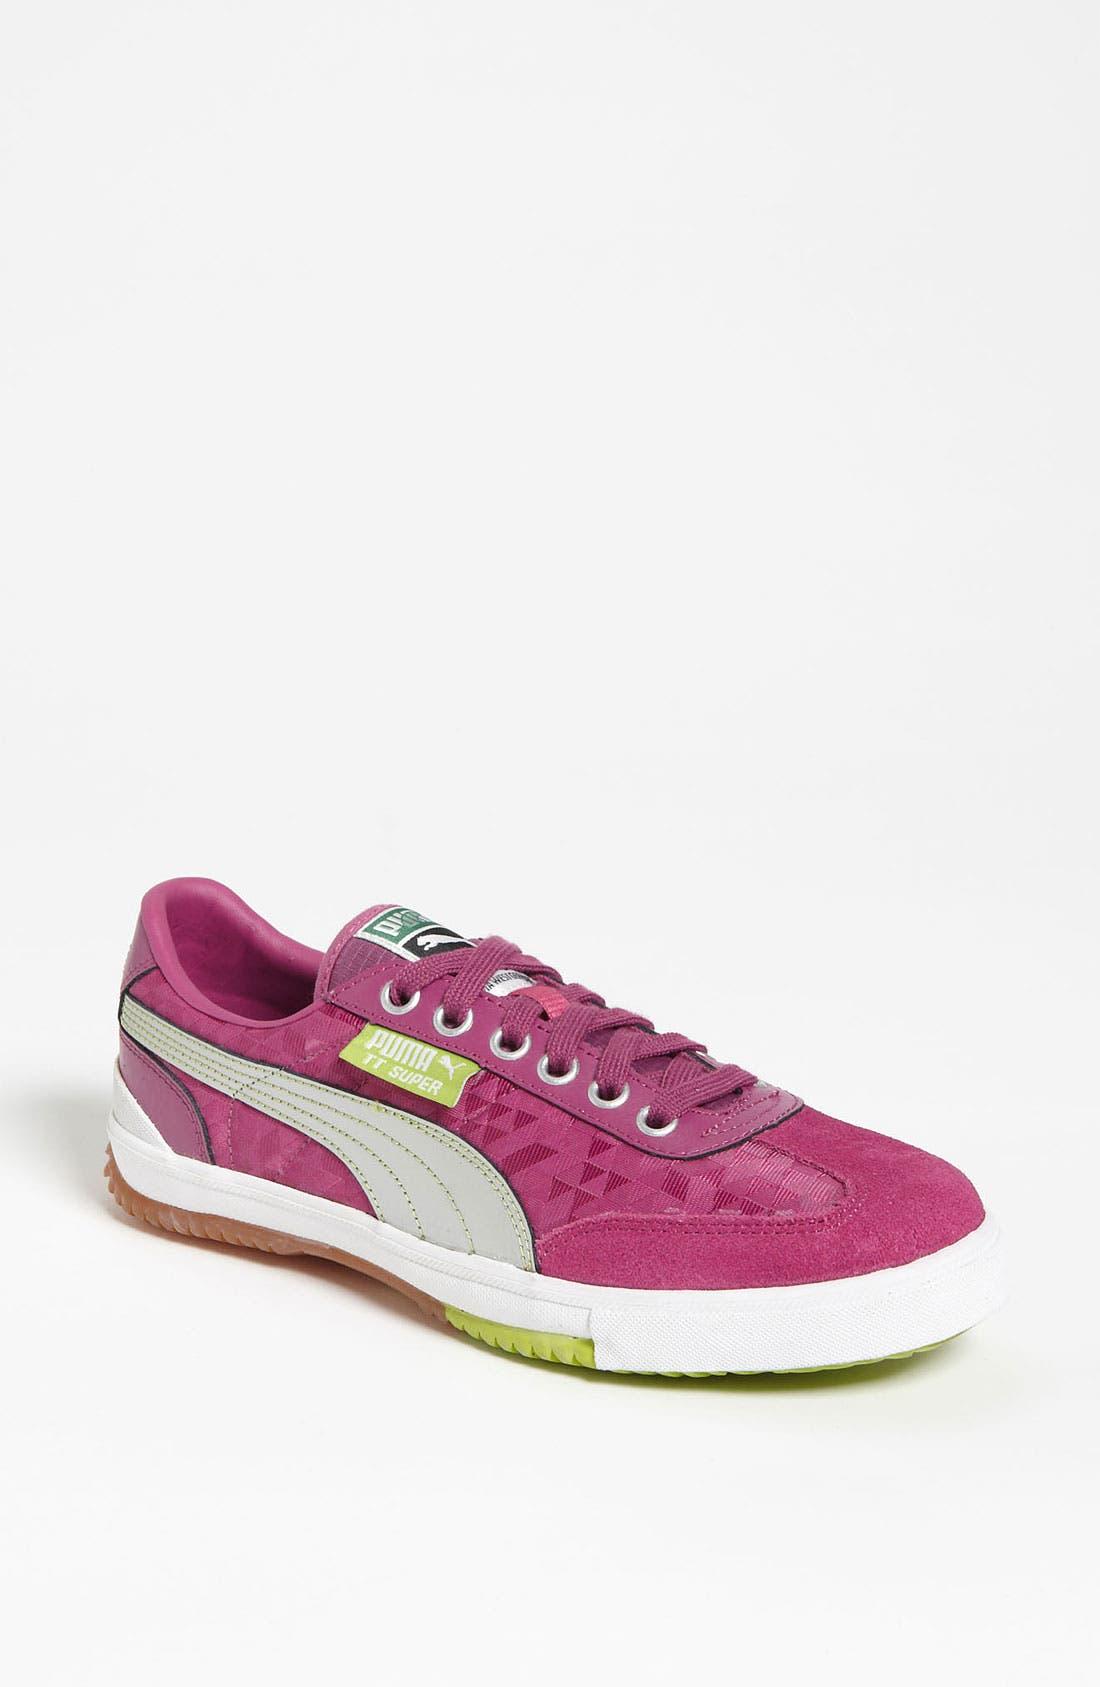 Main Image - PUMA 'TT Super Ripstop' Sneaker (Women)